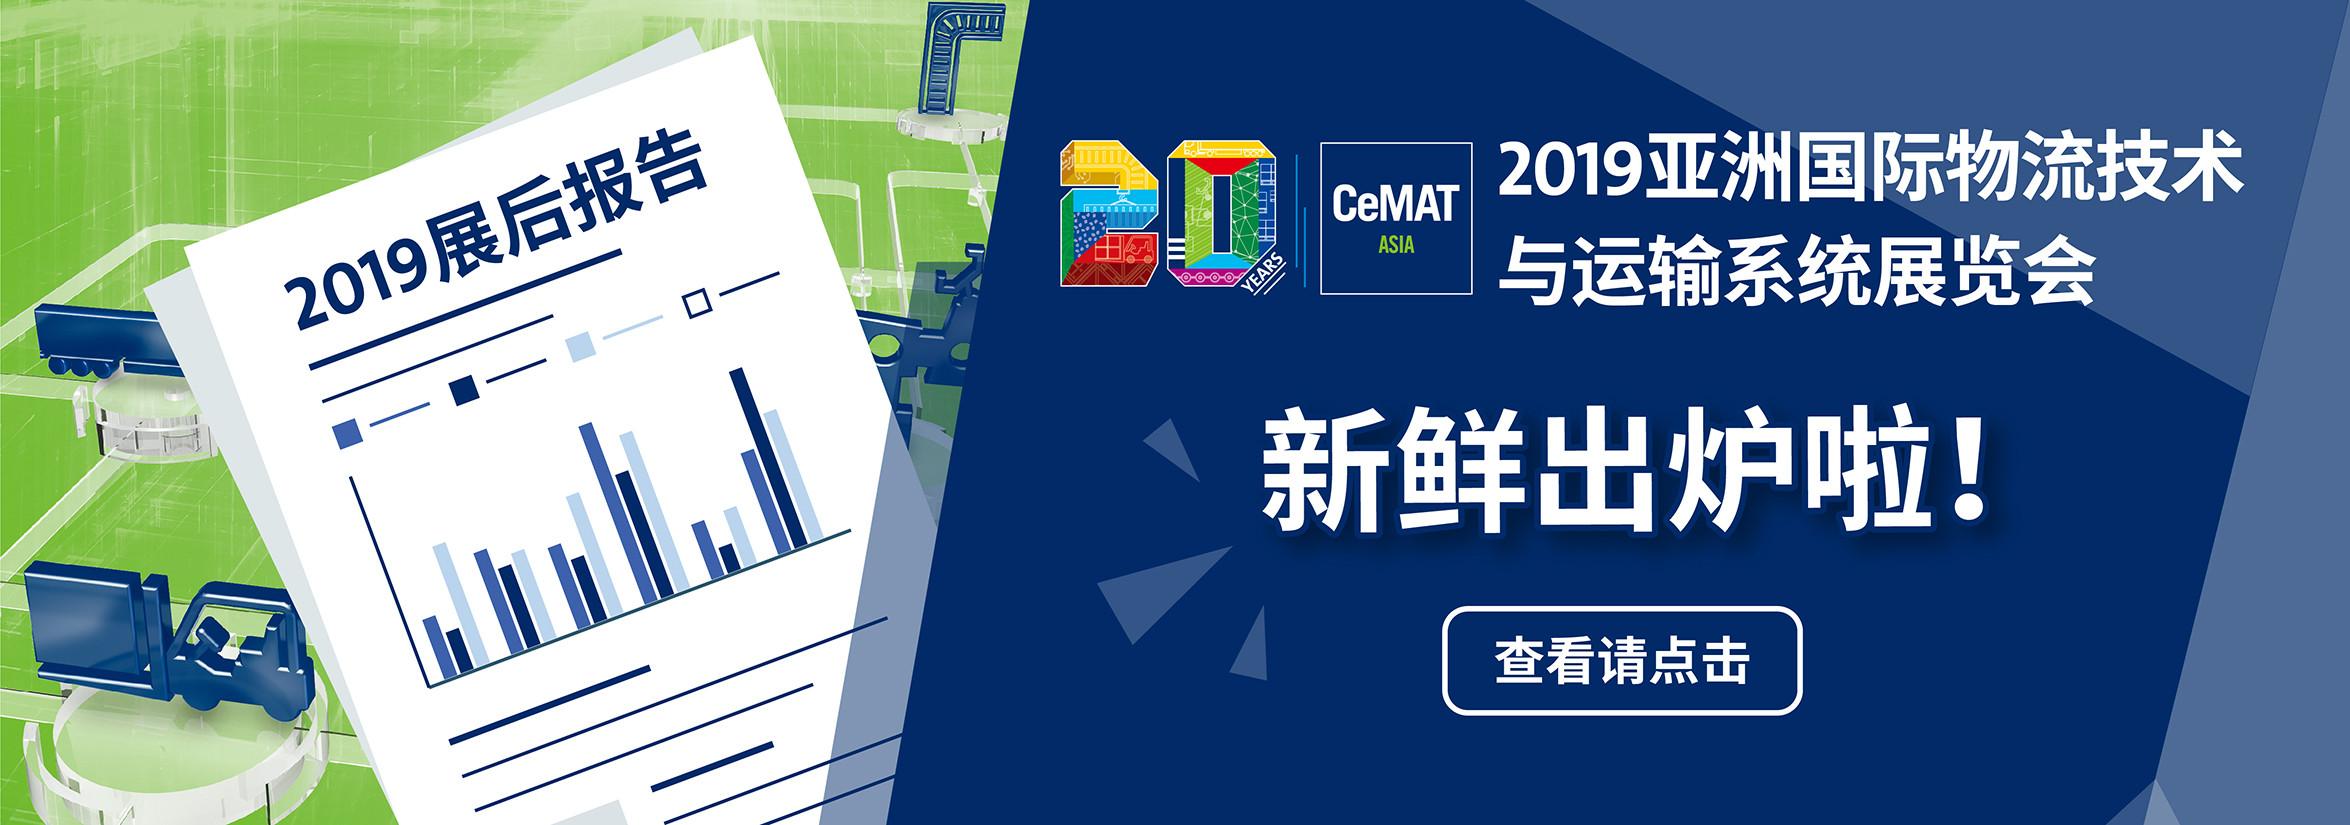 CeMAT ASIA 2019 展后报告